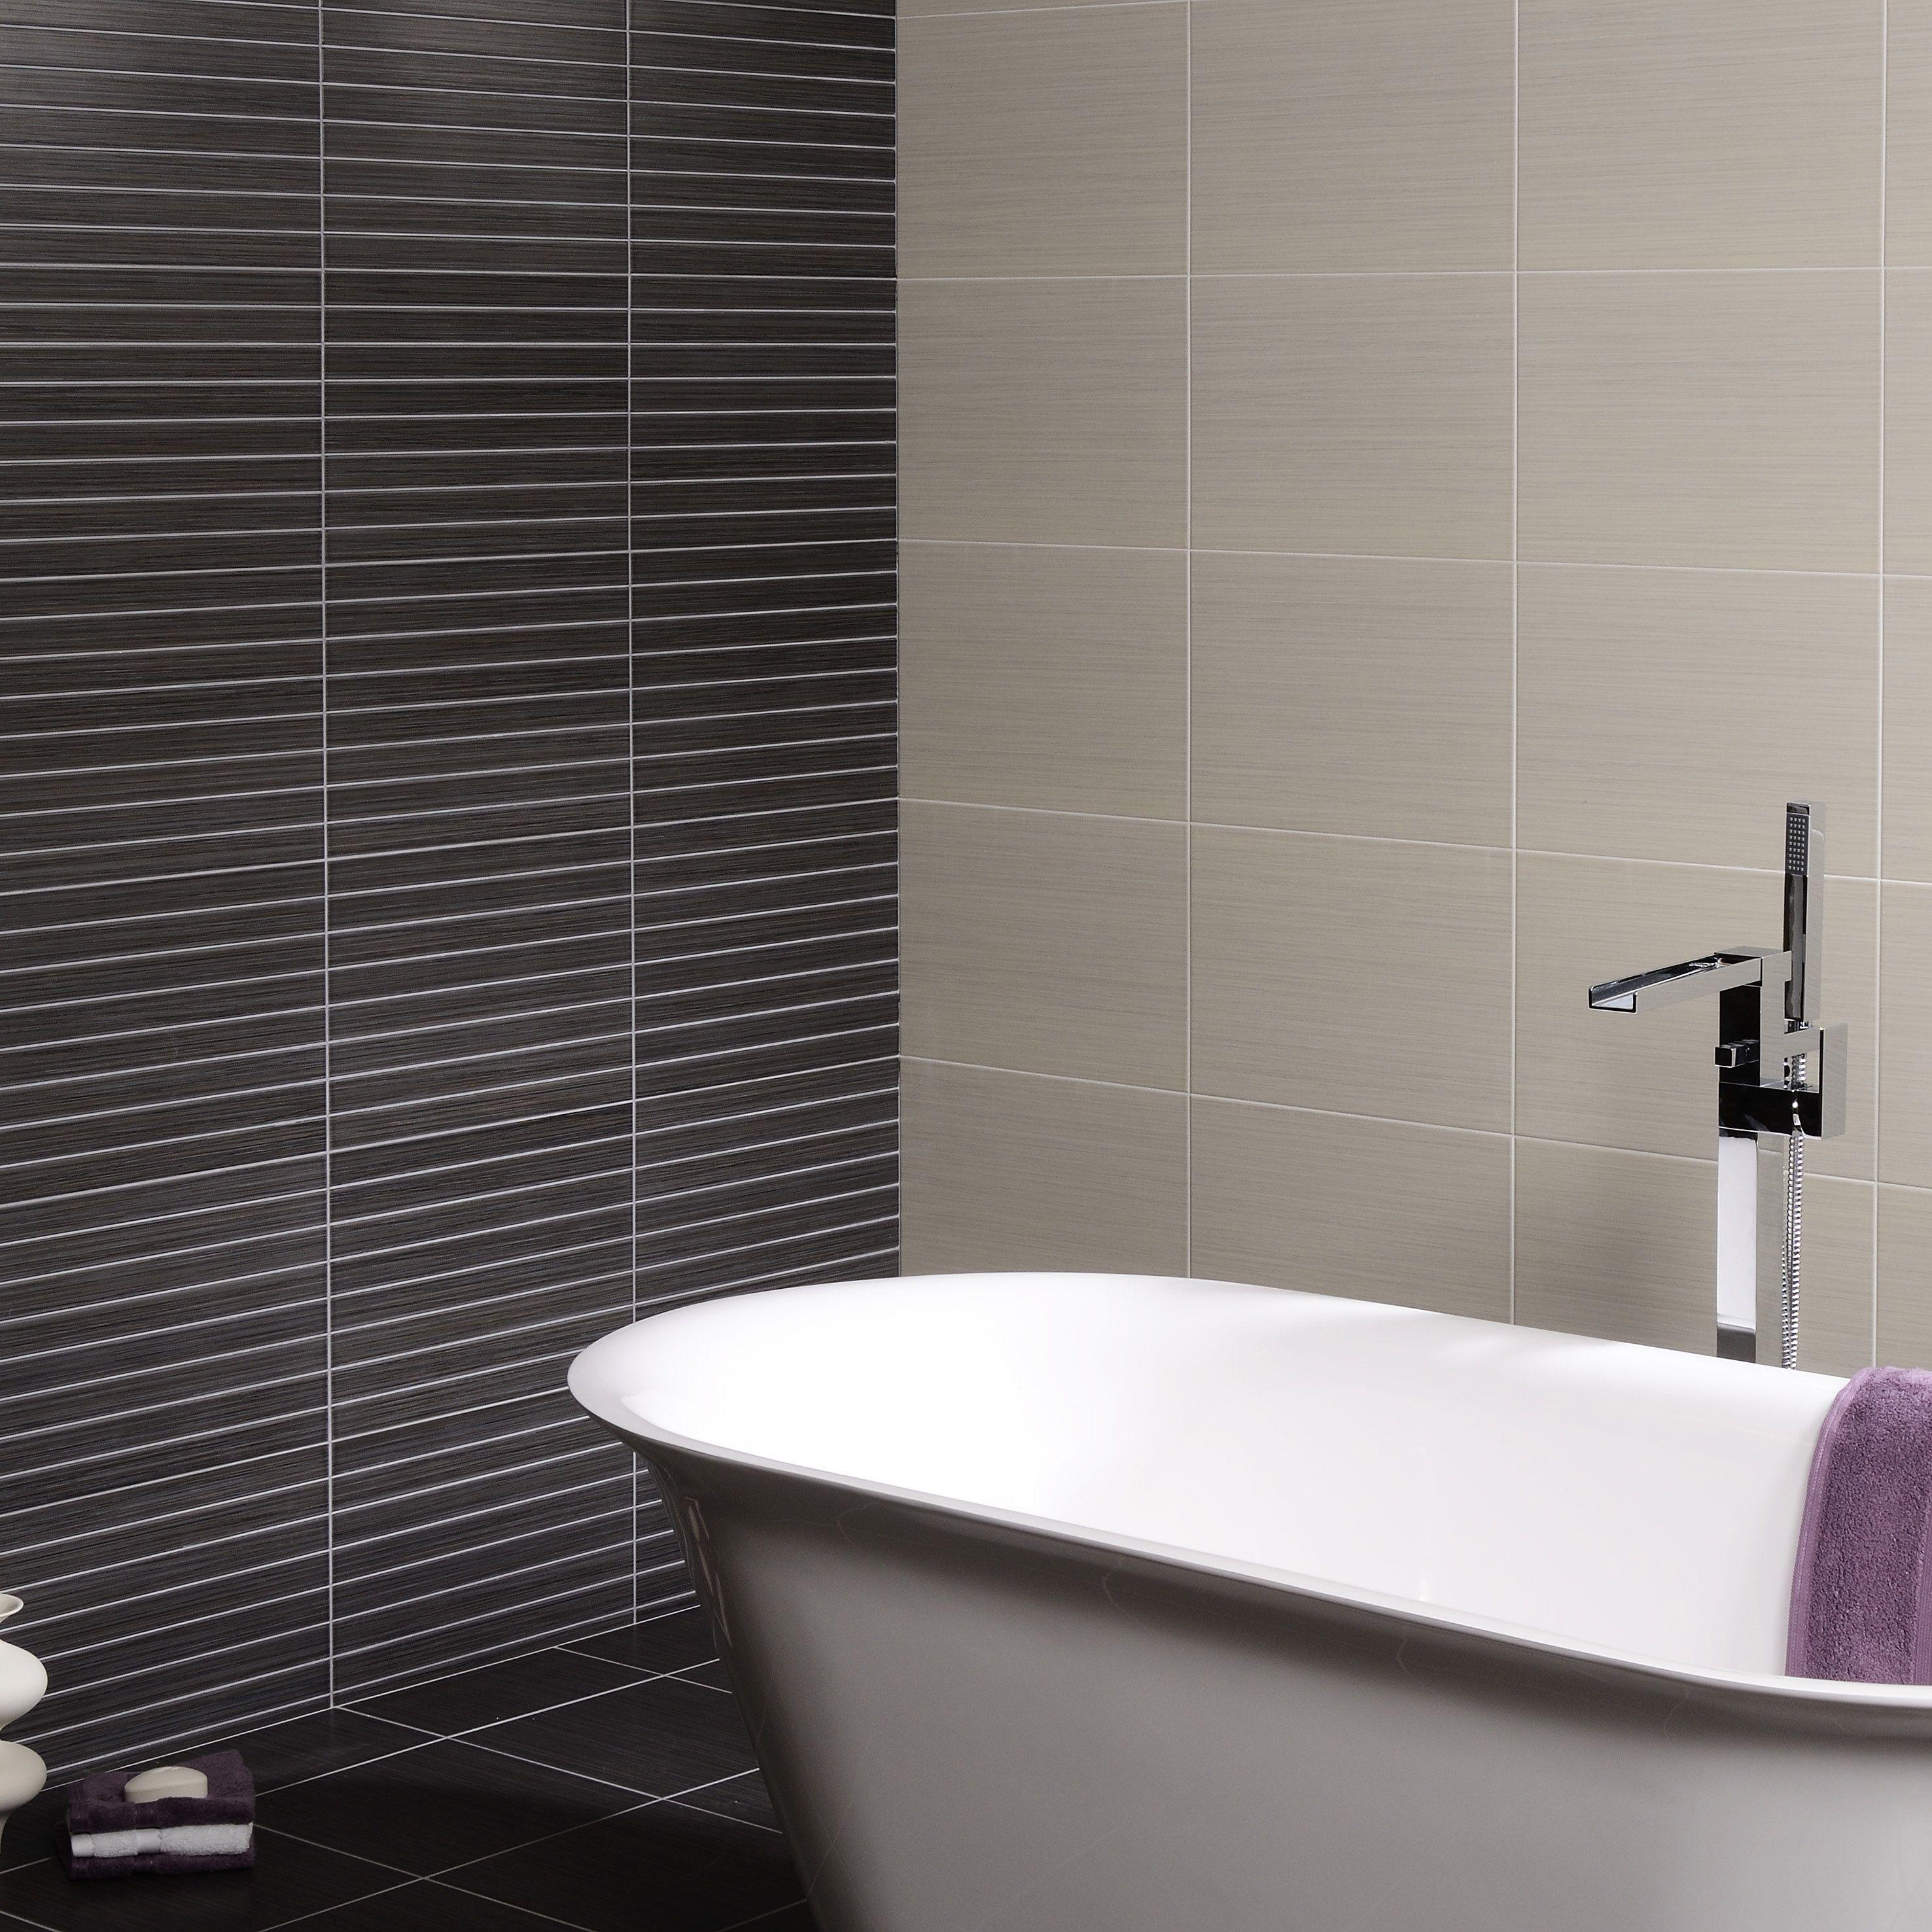 kiwu gris linea feature tiles. Black Bedroom Furniture Sets. Home Design Ideas